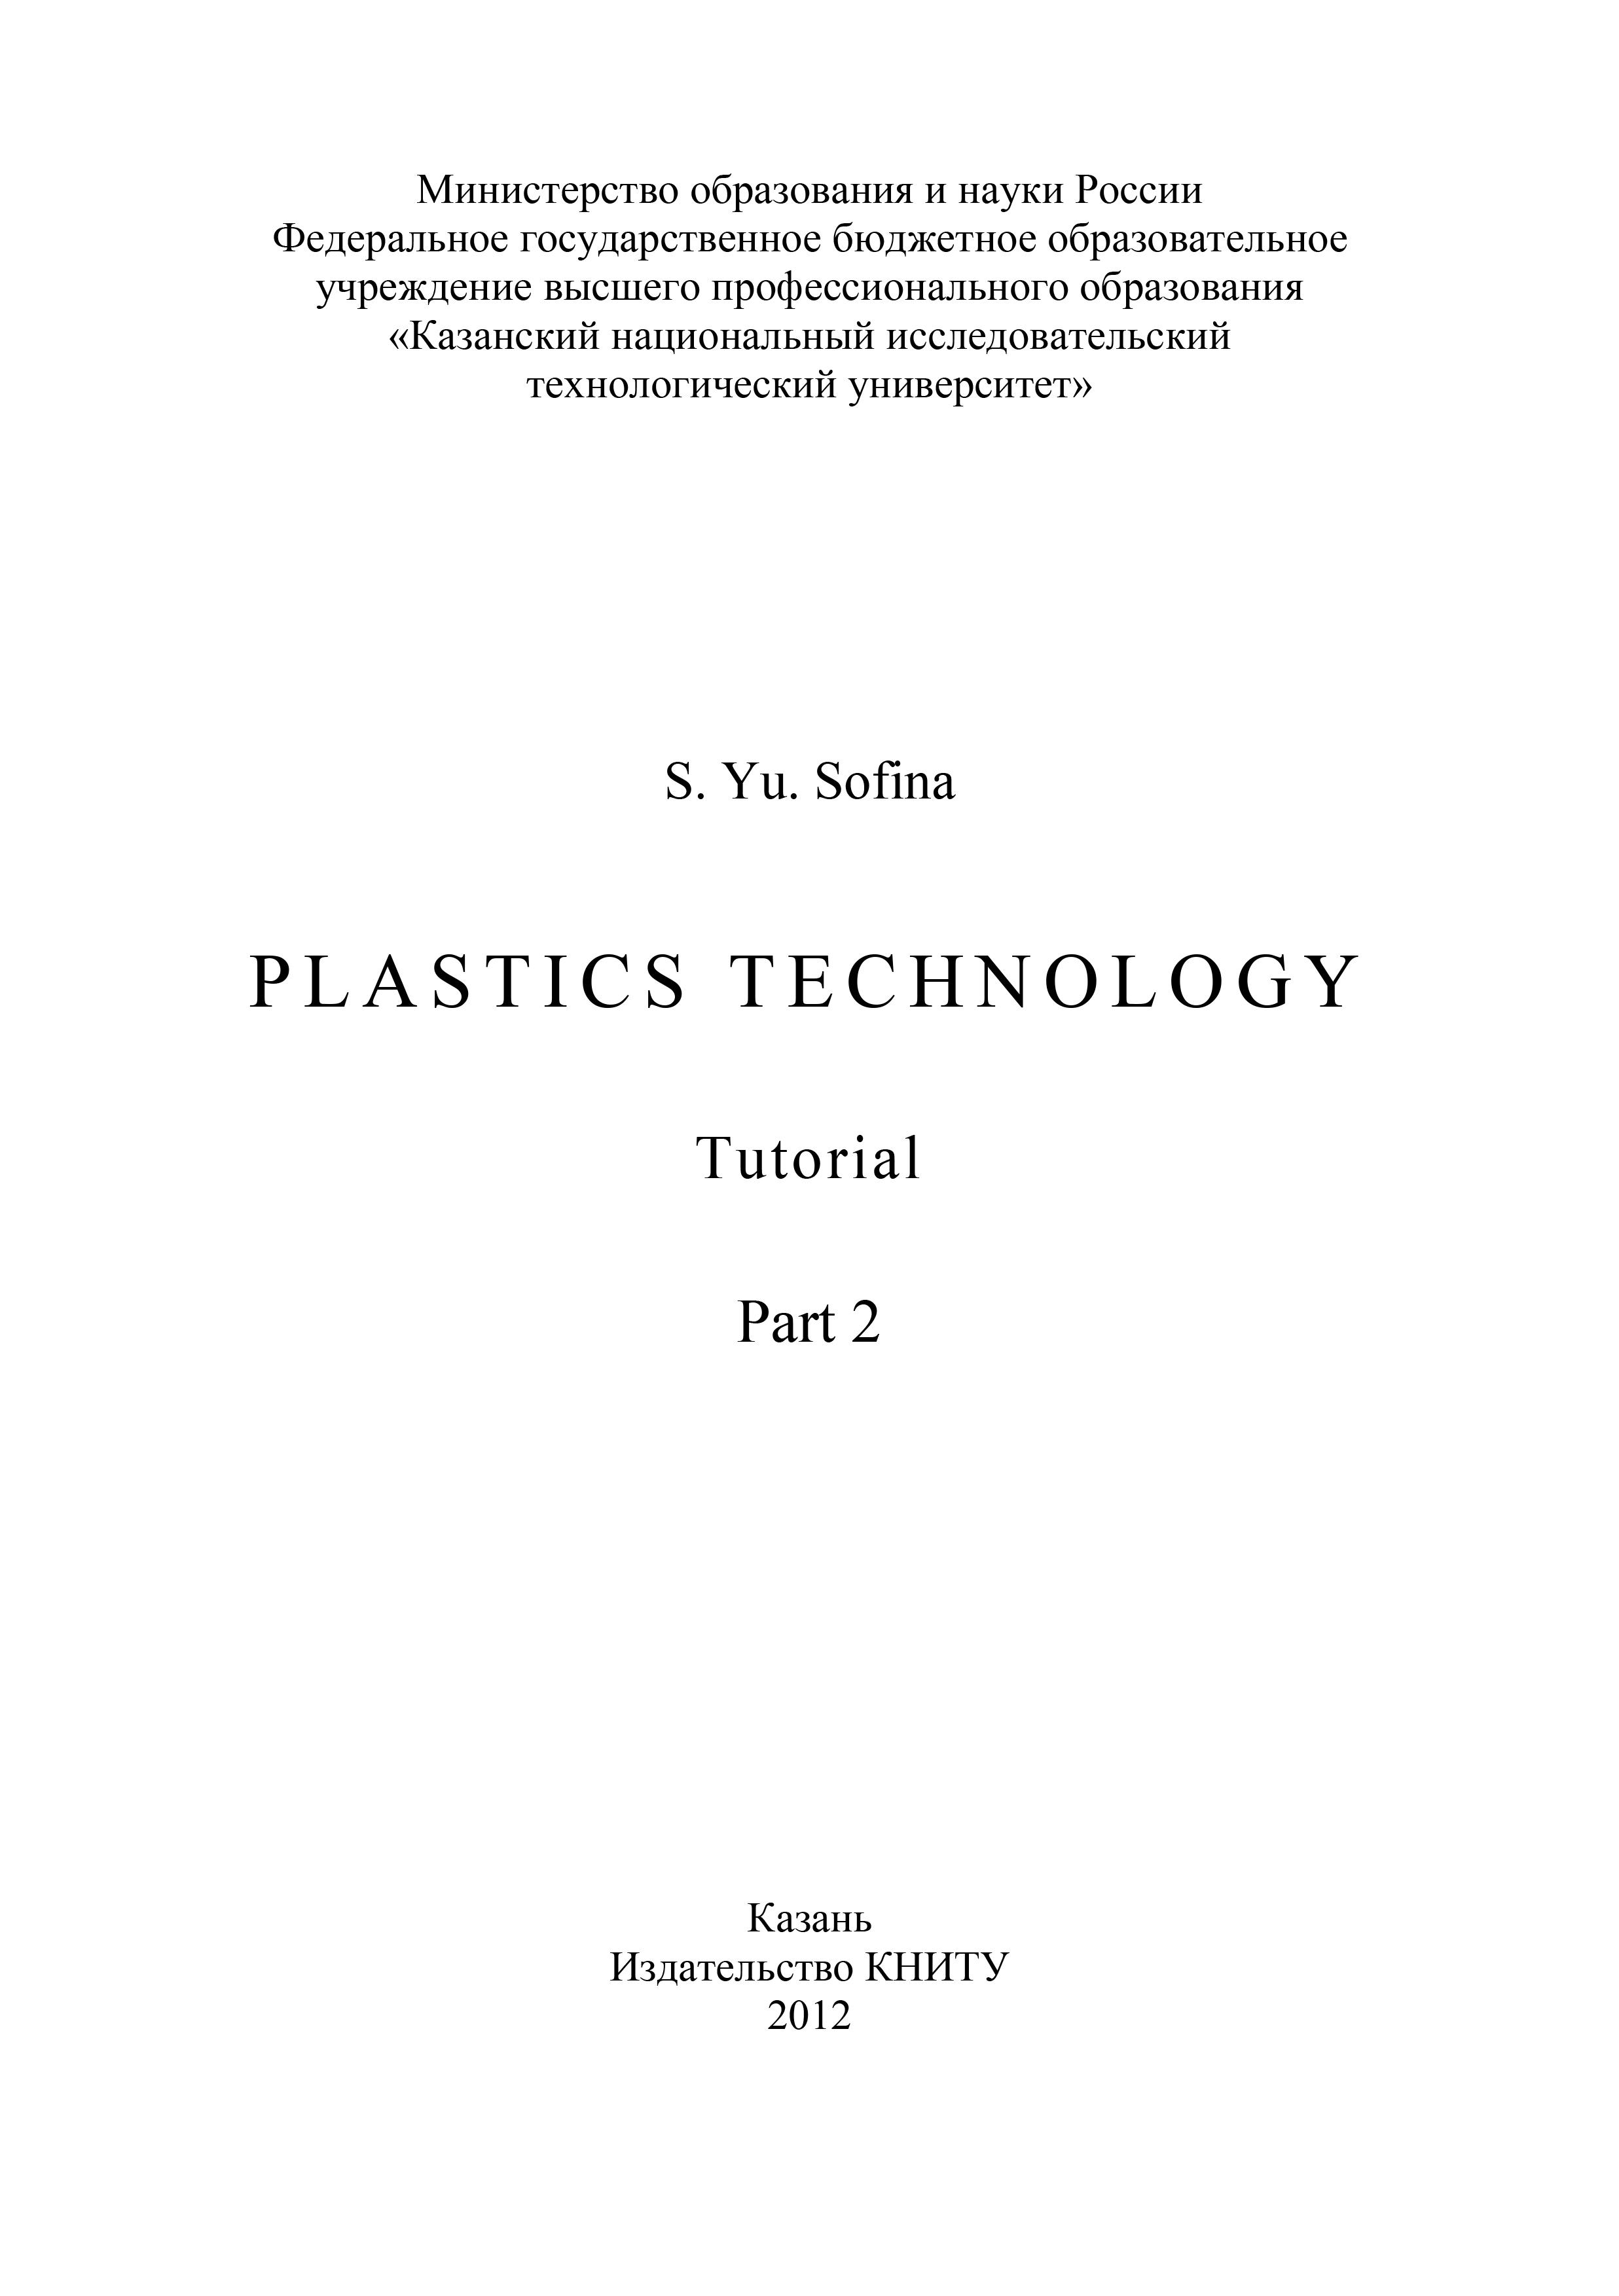 Plastics Technology. Part.2